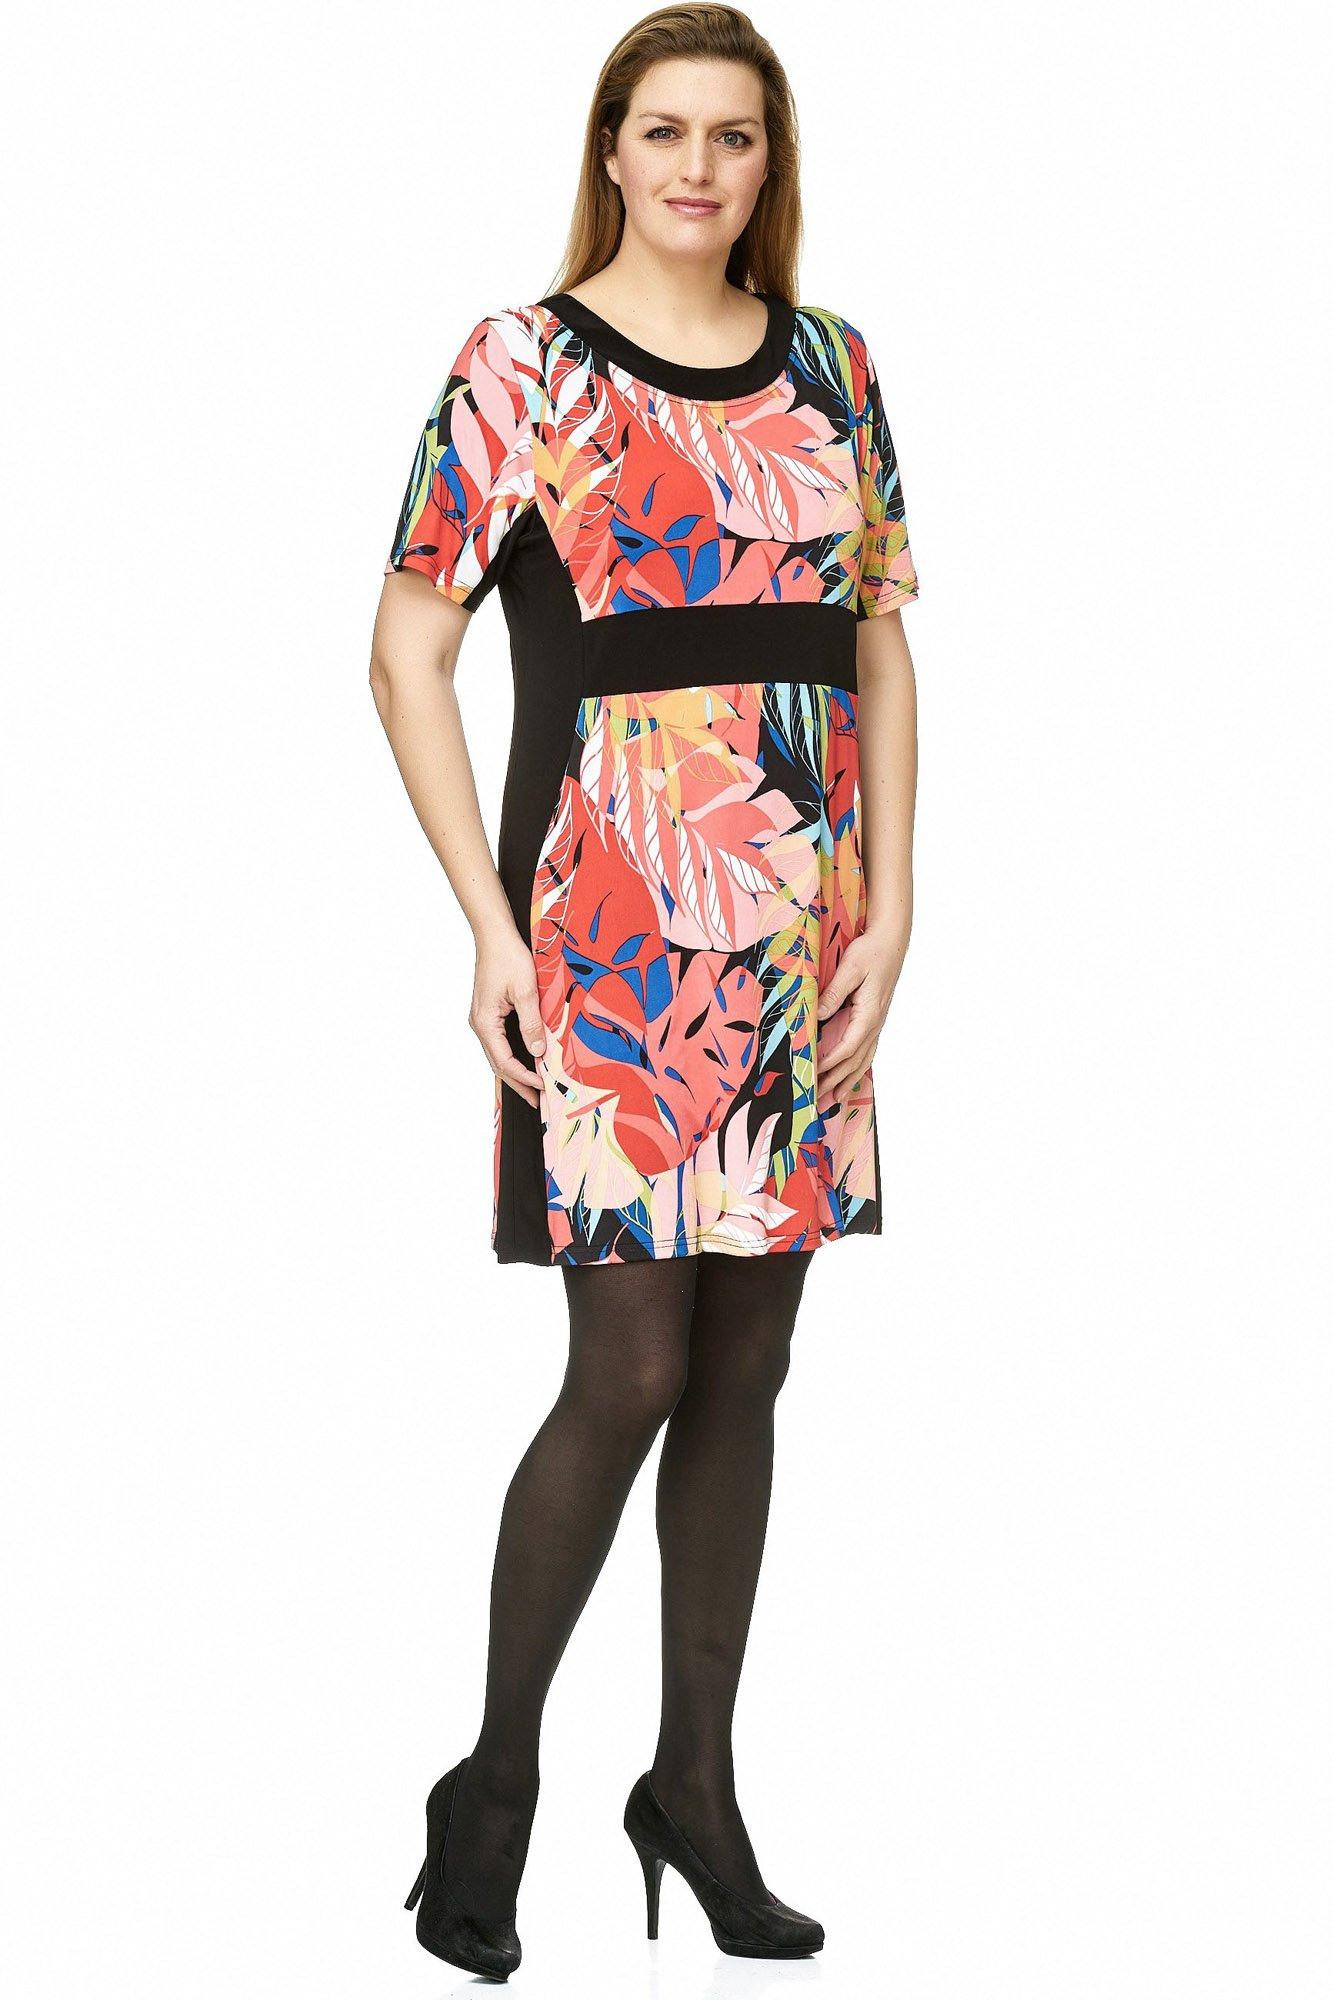 Verlockendes Tunika Kleid Mit Karibik Print  Maltex24